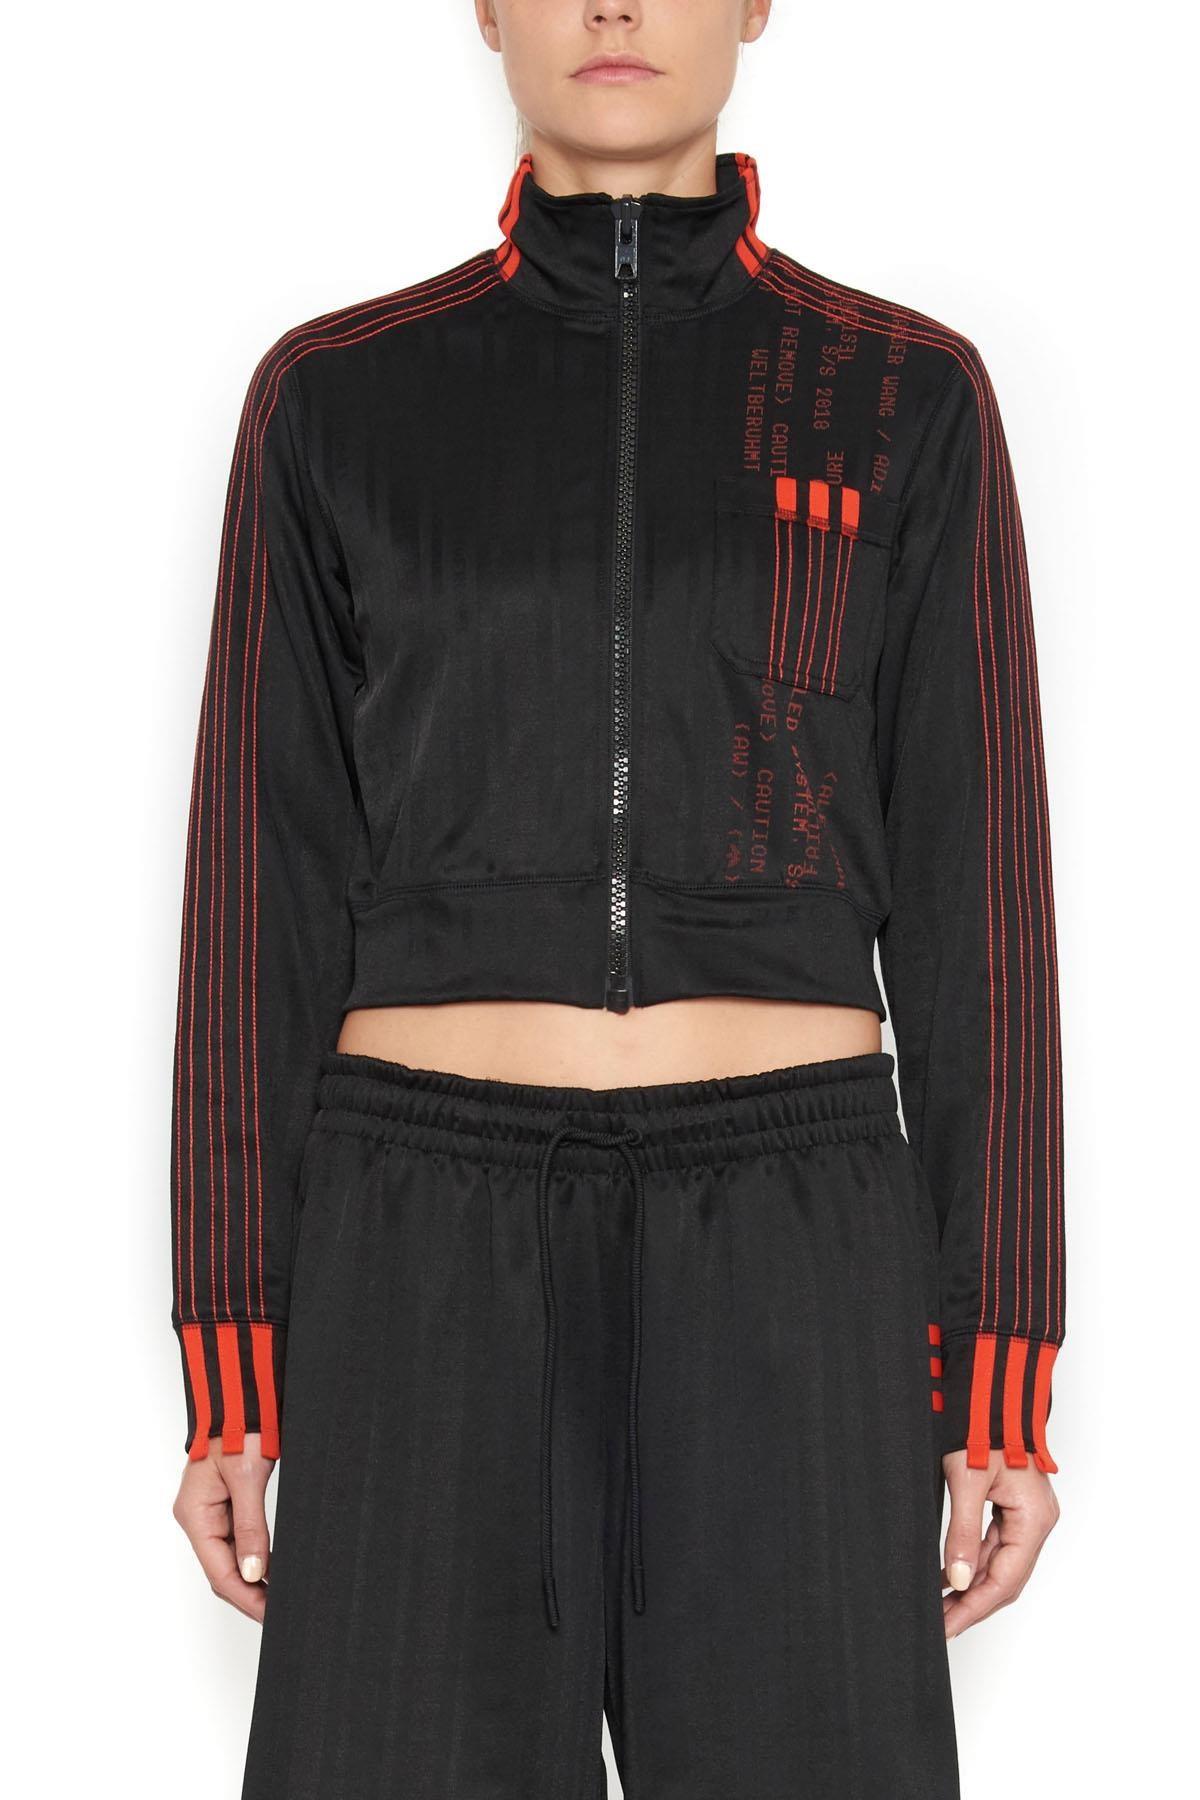 By Julian Crop Su Adidas Originals Wang Felpa Alexander HqwR5xS0